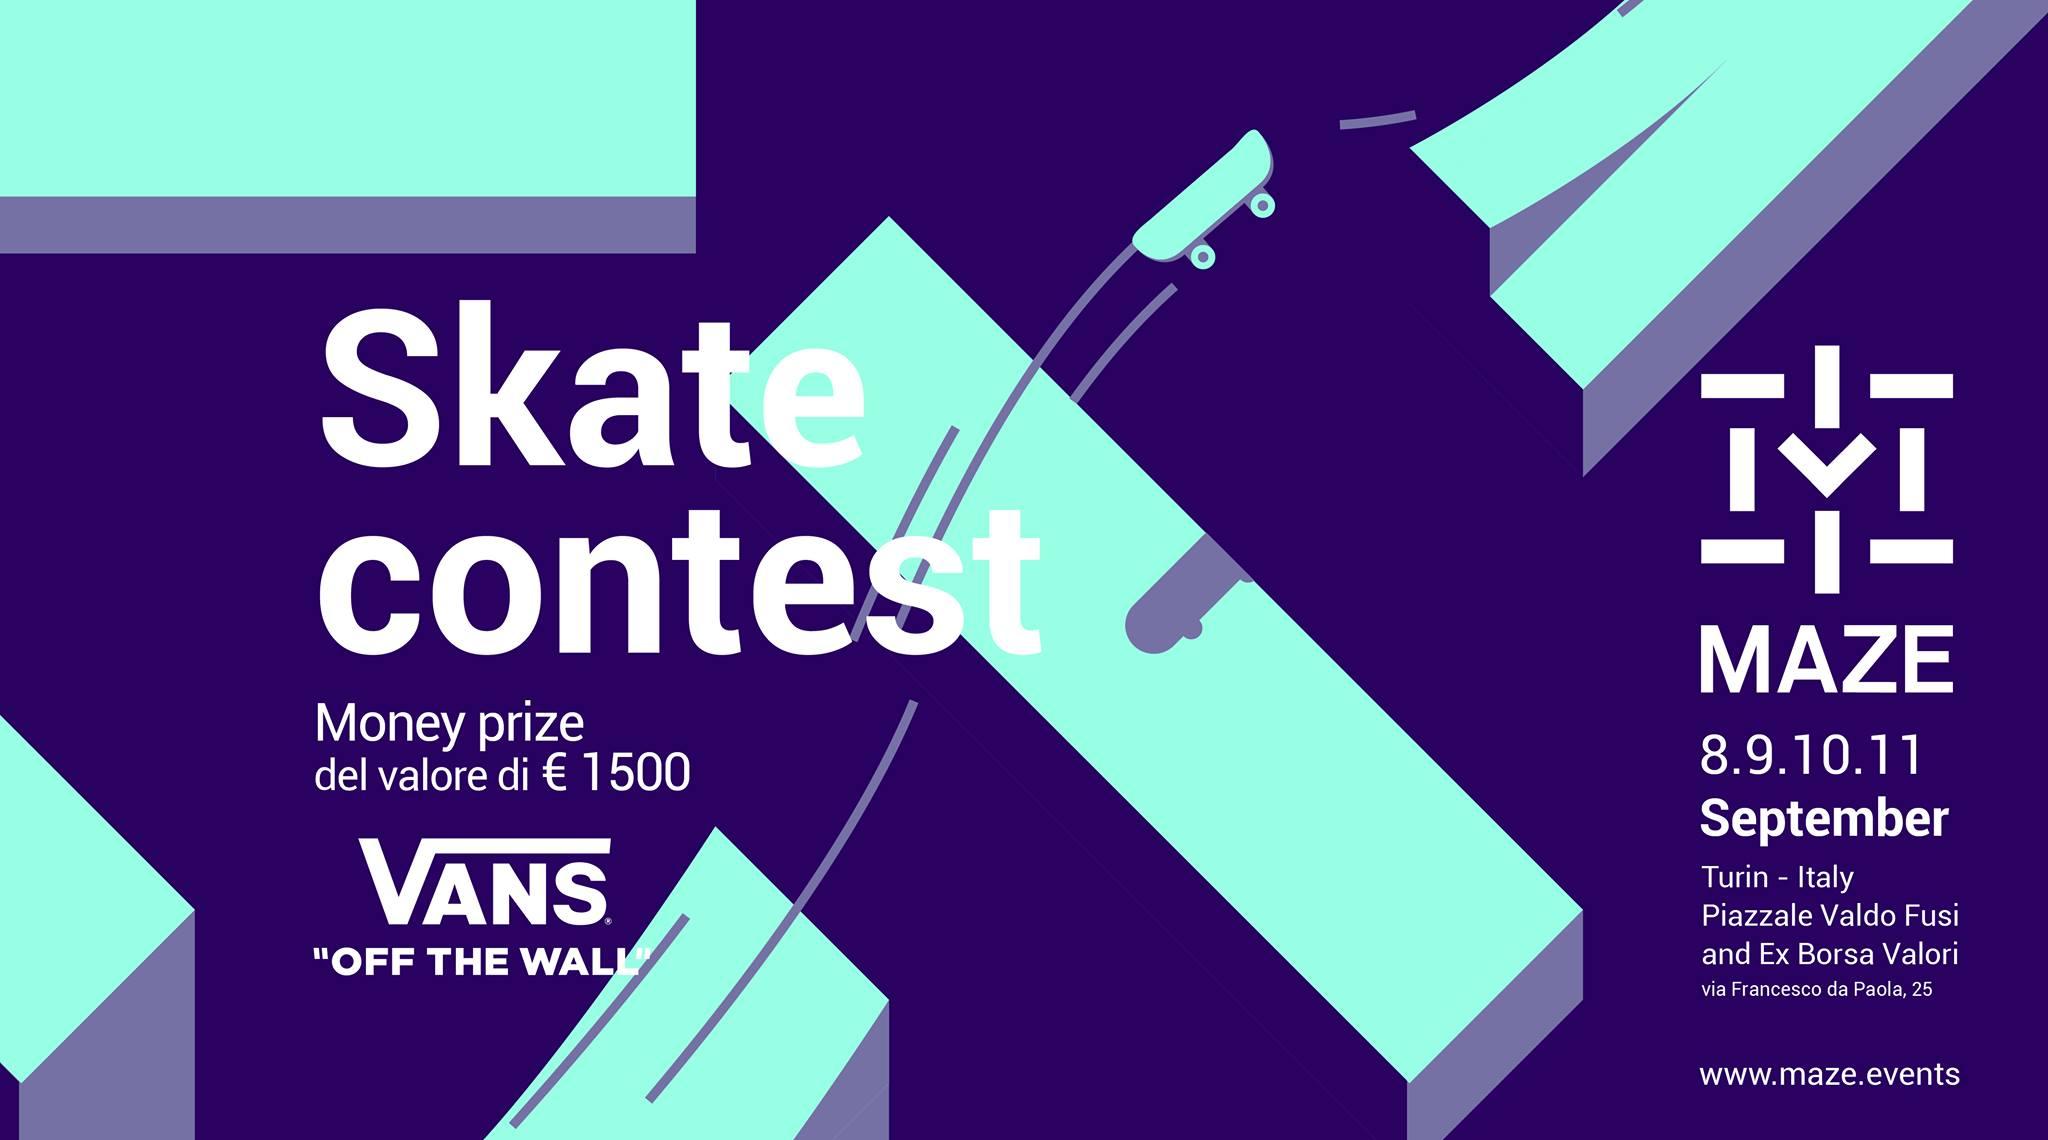 maze-skateboard-contest